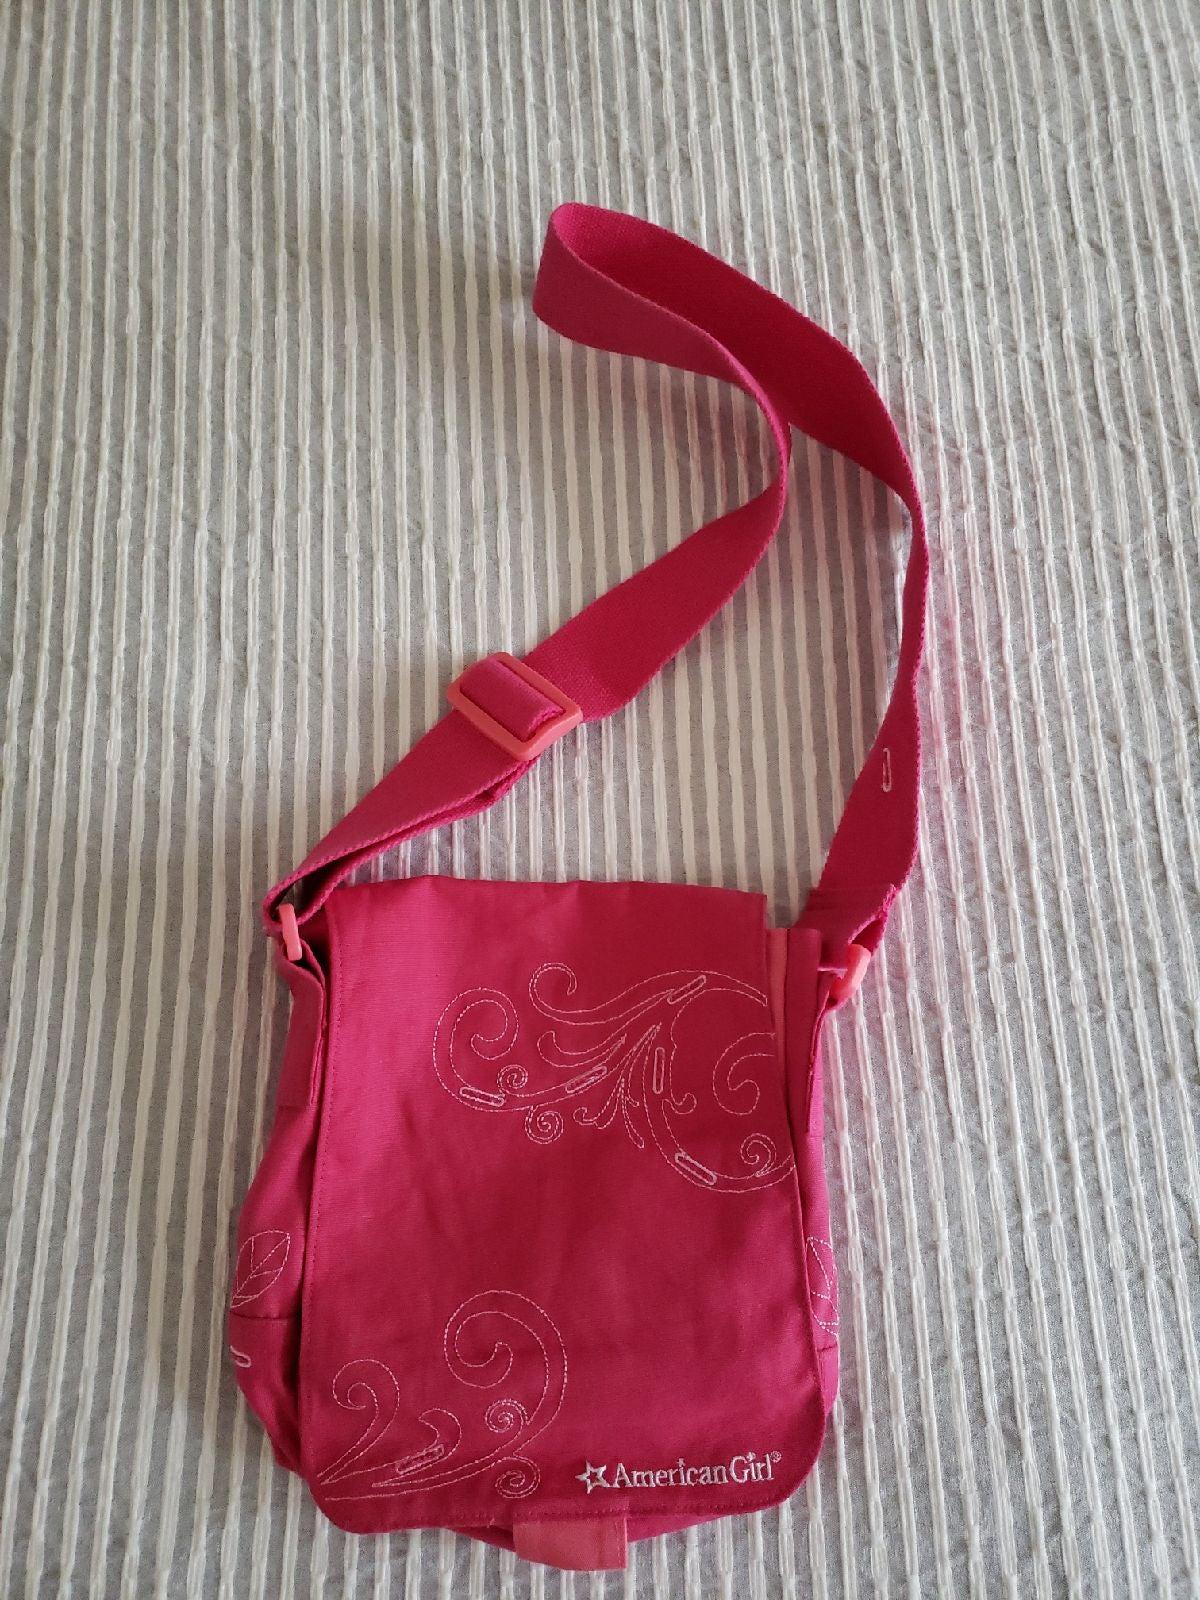 American Girl Pink Crossbody Bag